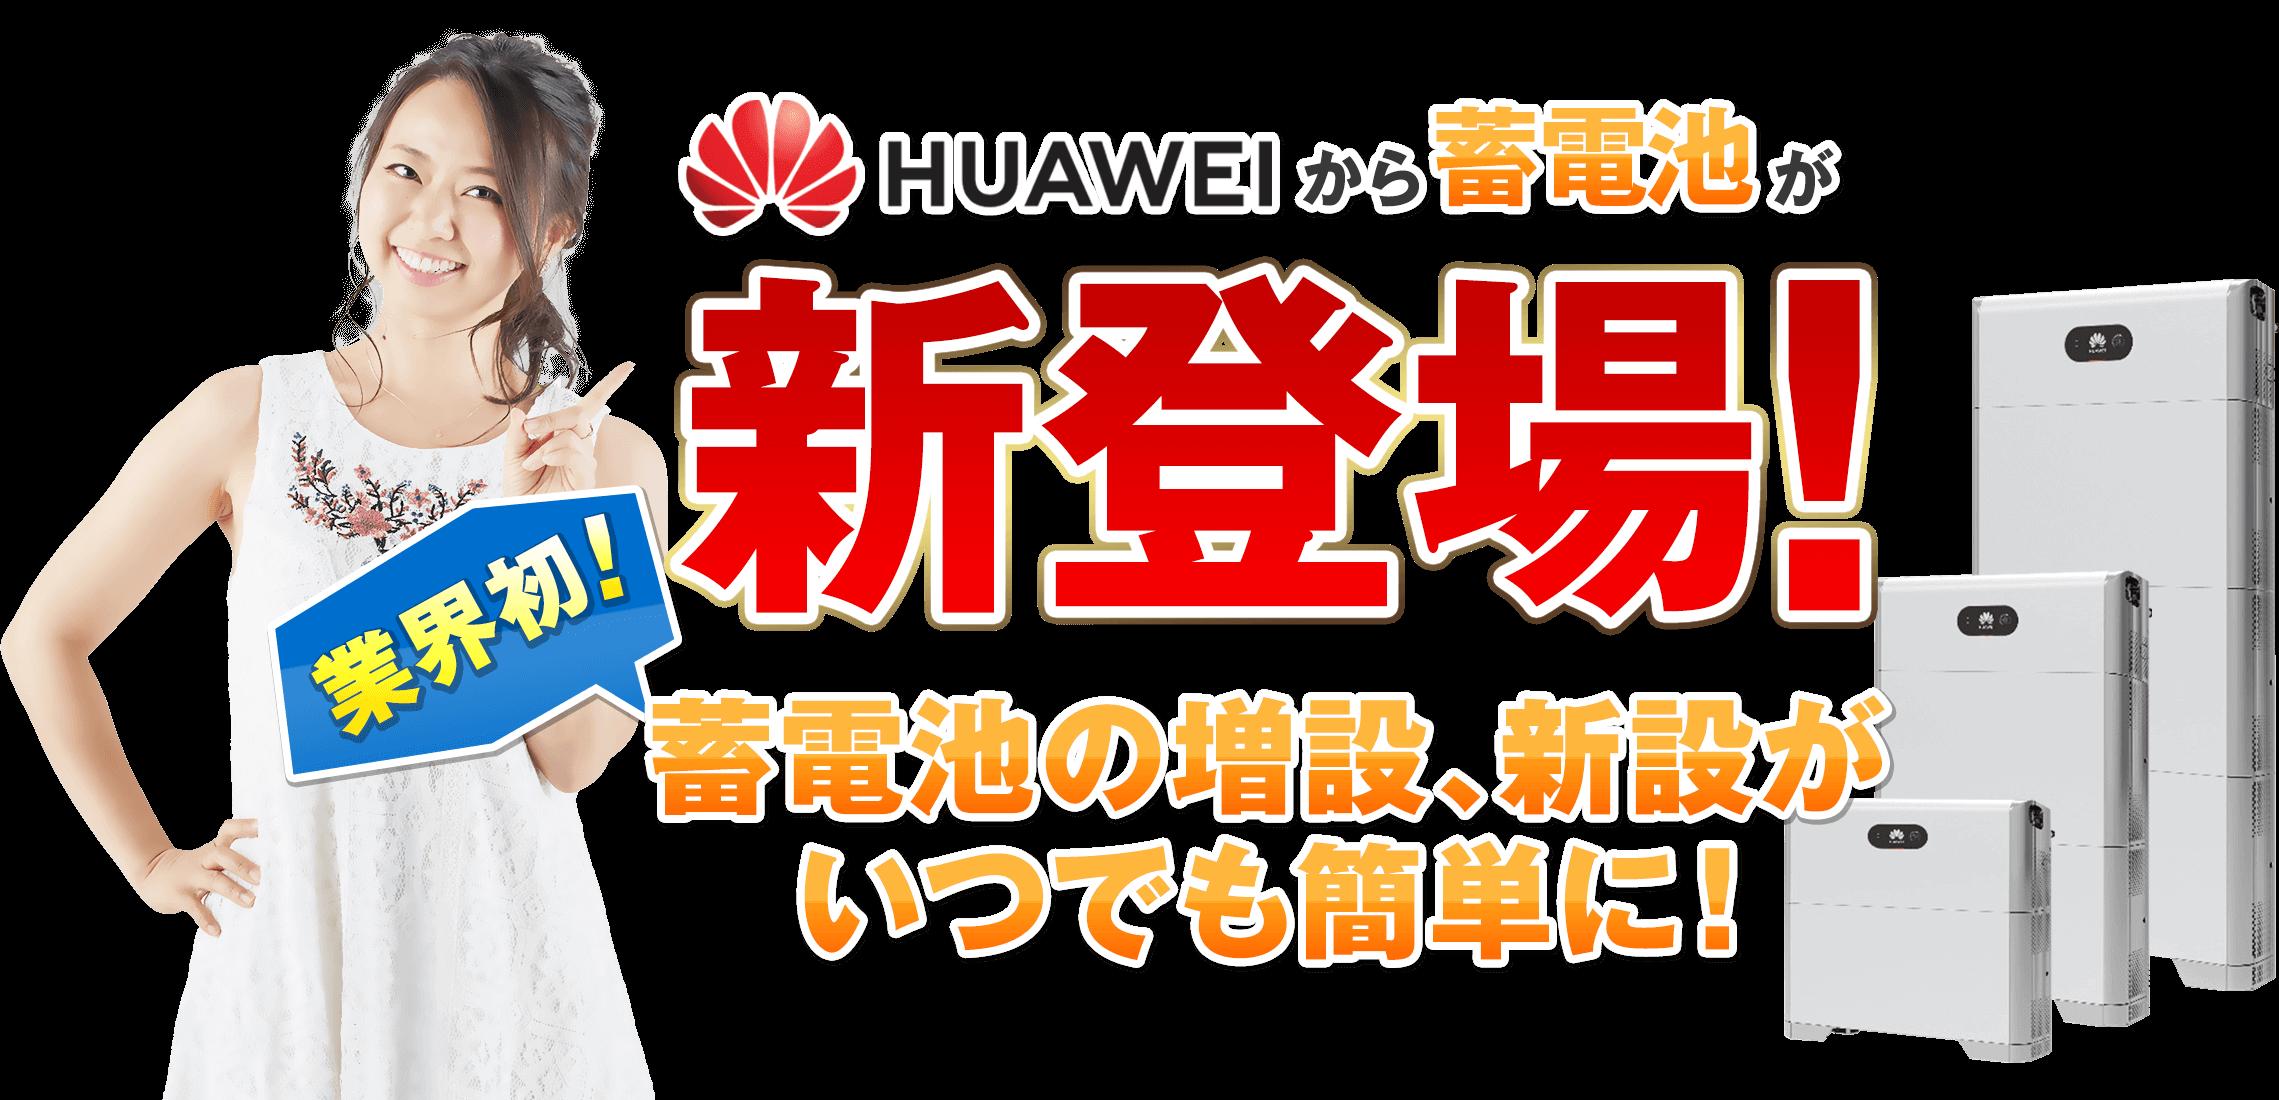 HUAWEIから蓄電池が新登場!蓄電池の増設、新設がいつでも簡単に!